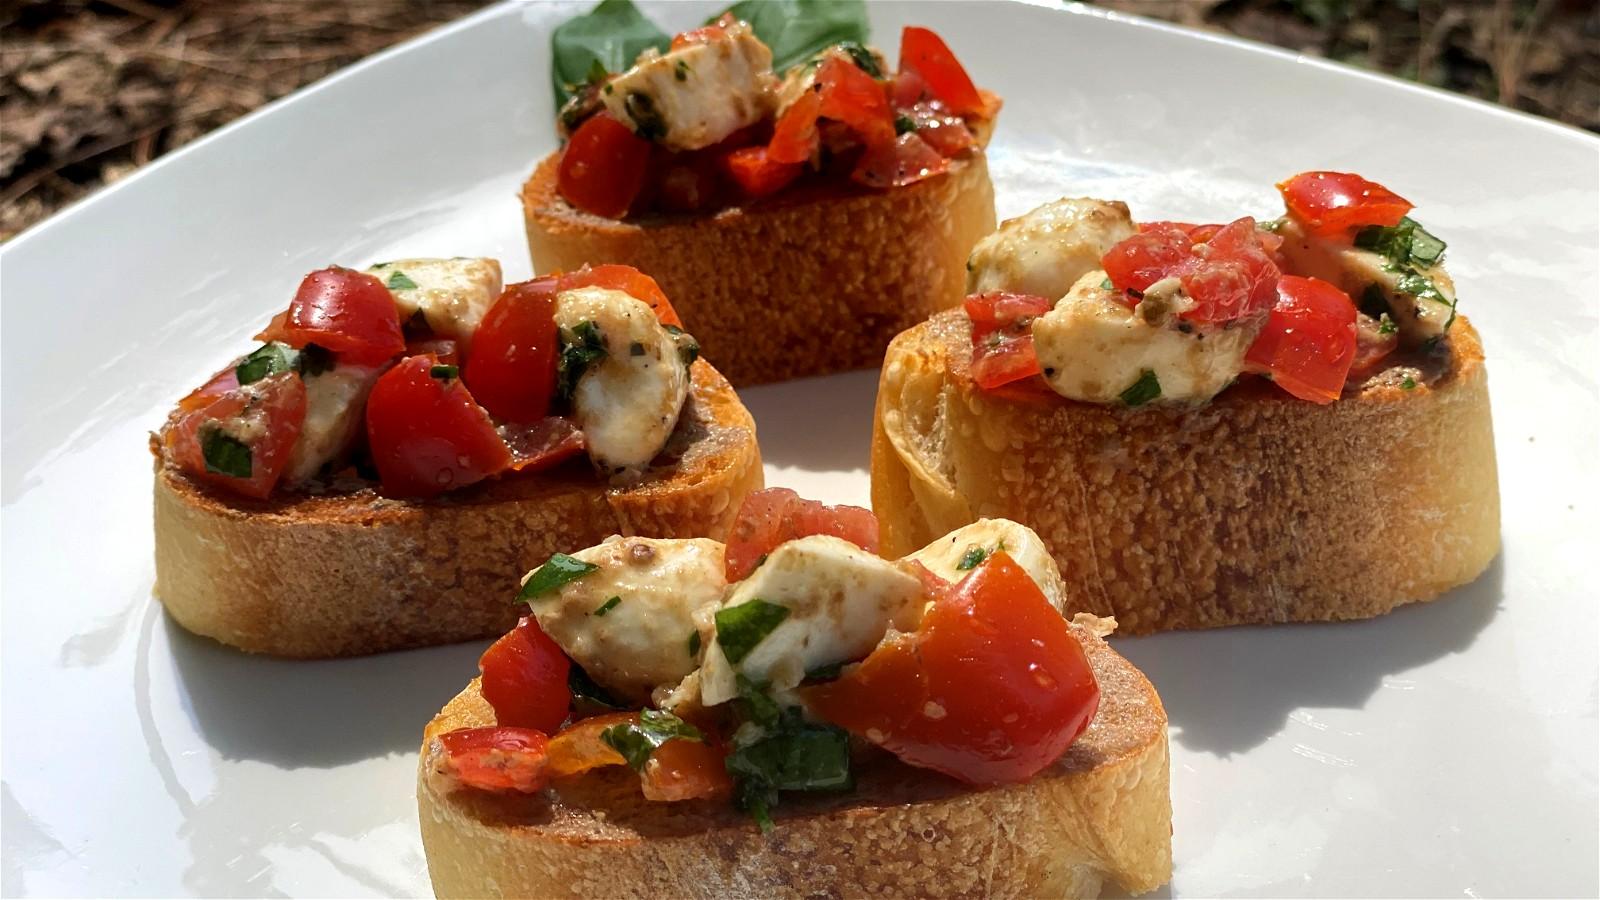 Image of Tomato Mozzarella Bruschetta with White Truffle Sauce